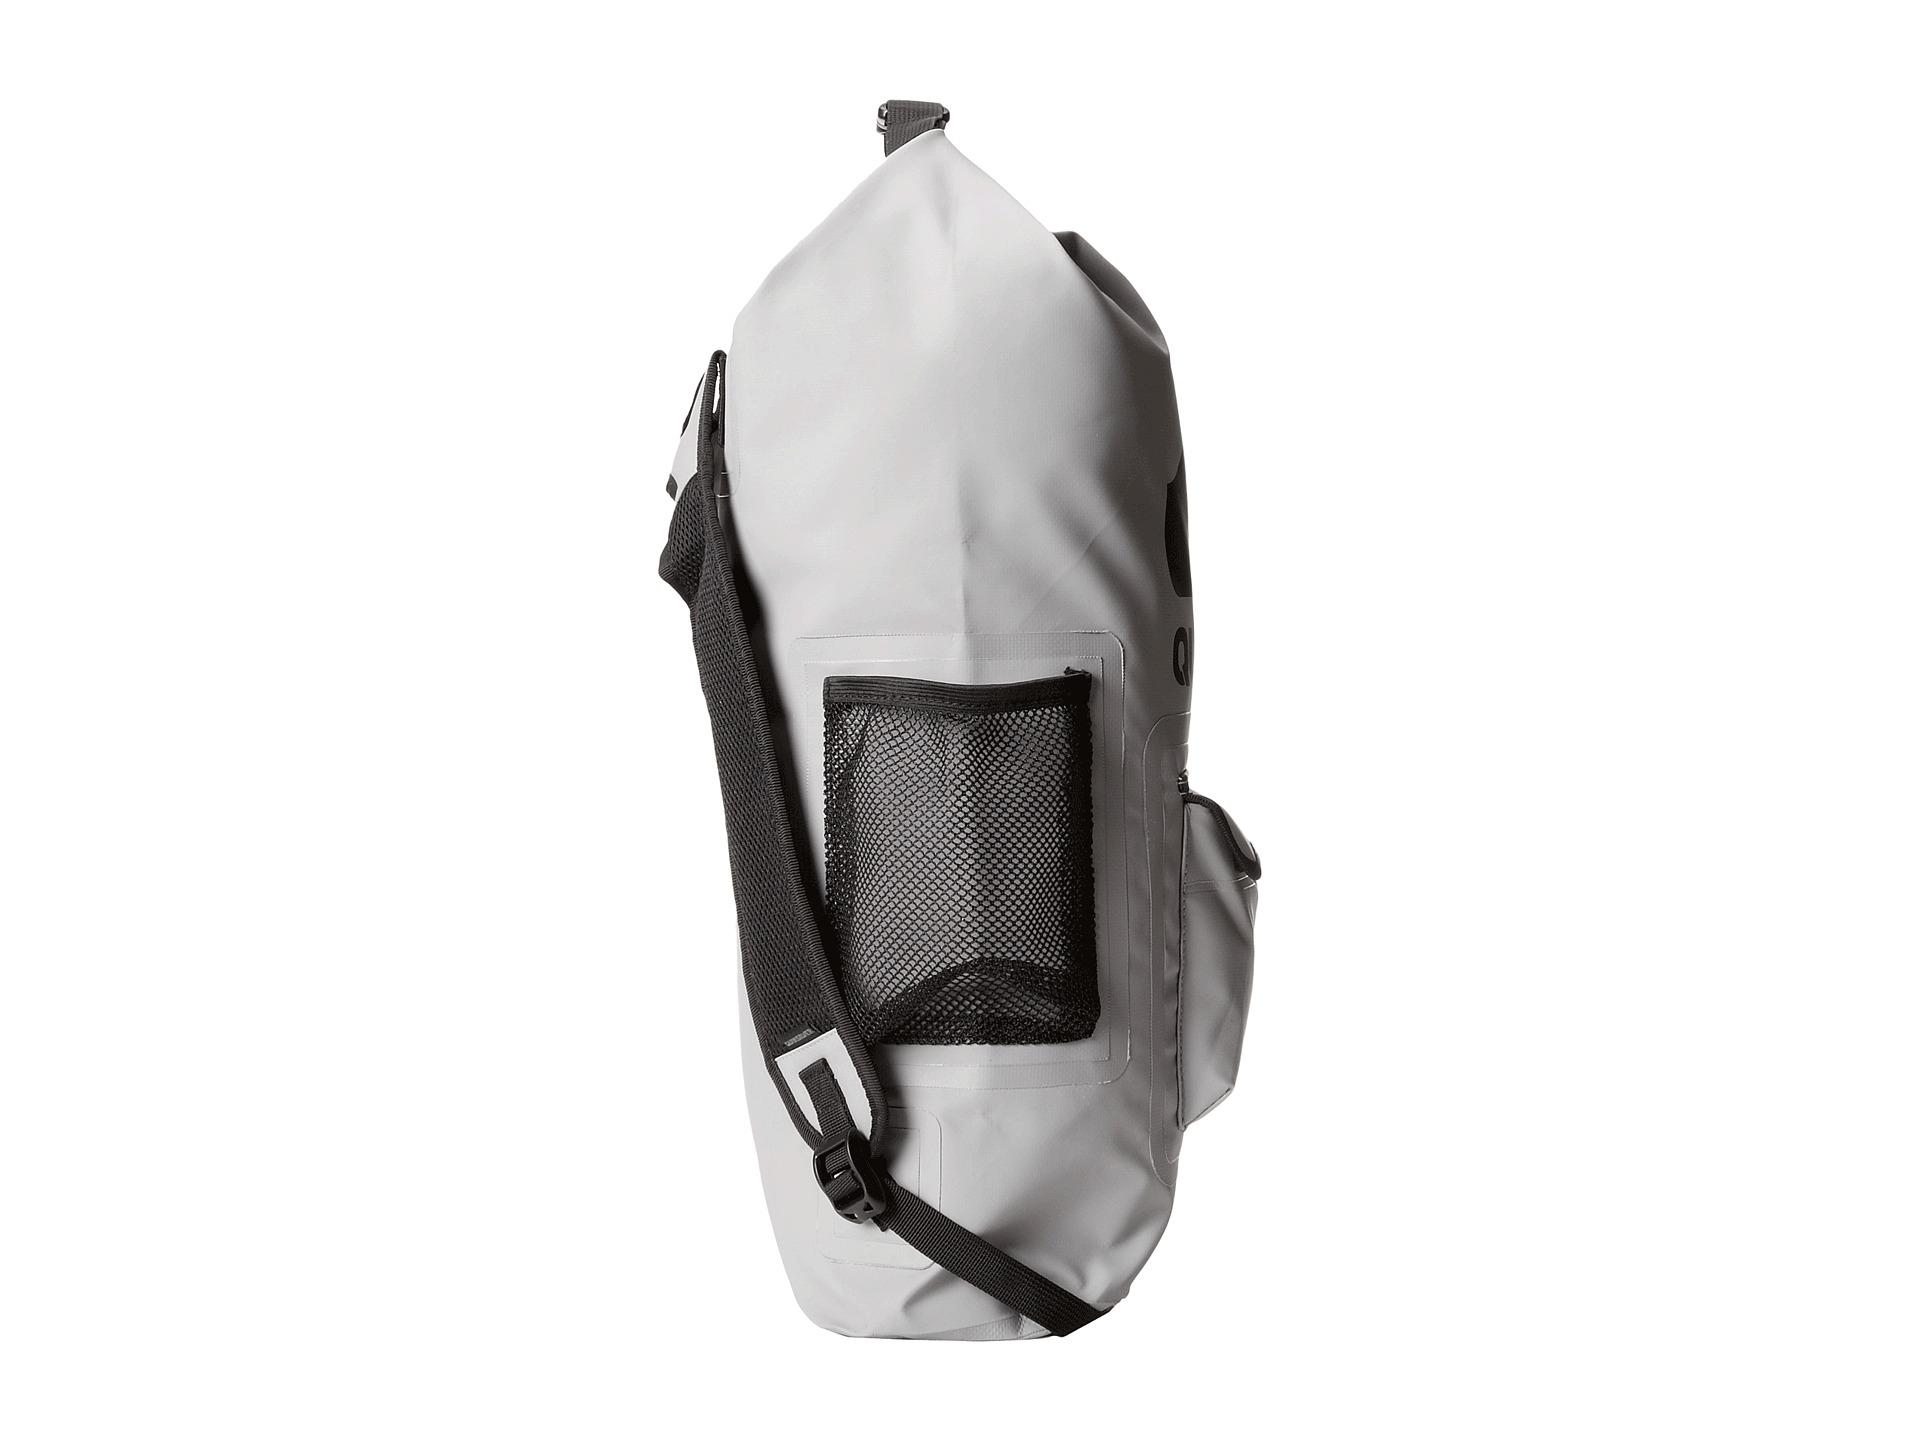 Lyst - Quiksilver Sea Stash Roll Top Sealable Dry Bag in Gray for Men 32de1295f7c8d